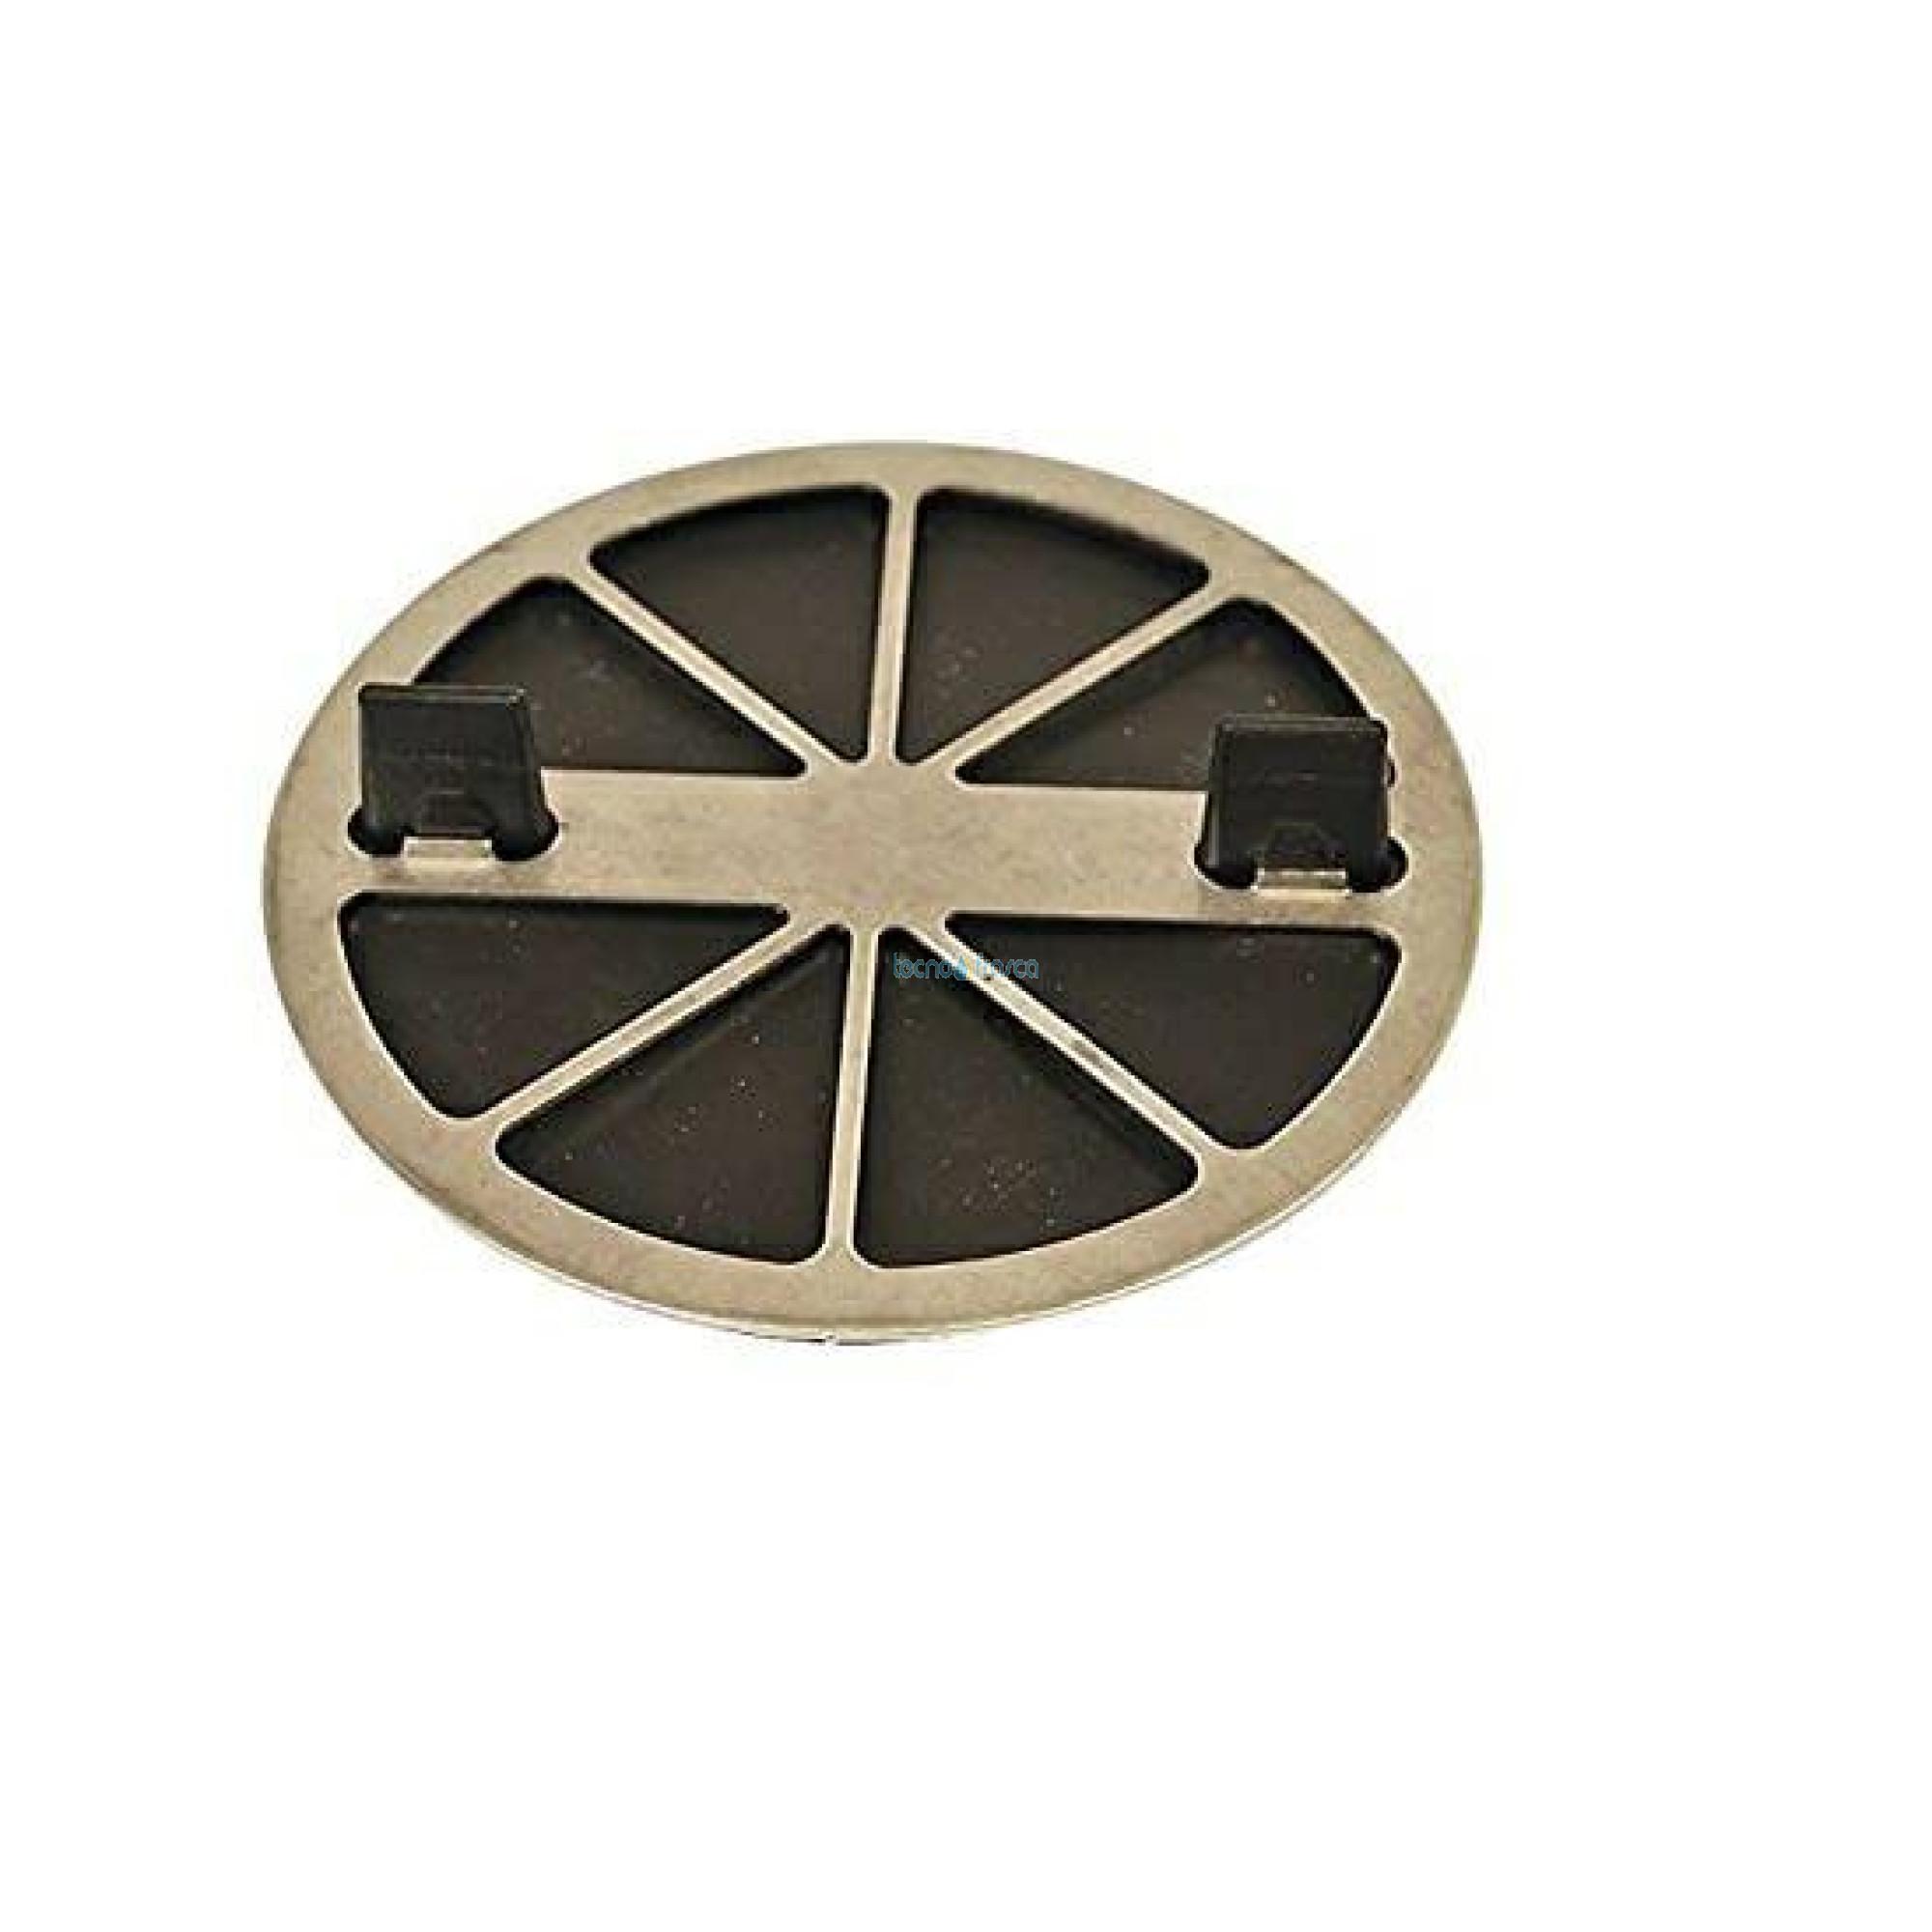 Junkers bosch membrana piattello 8715505801